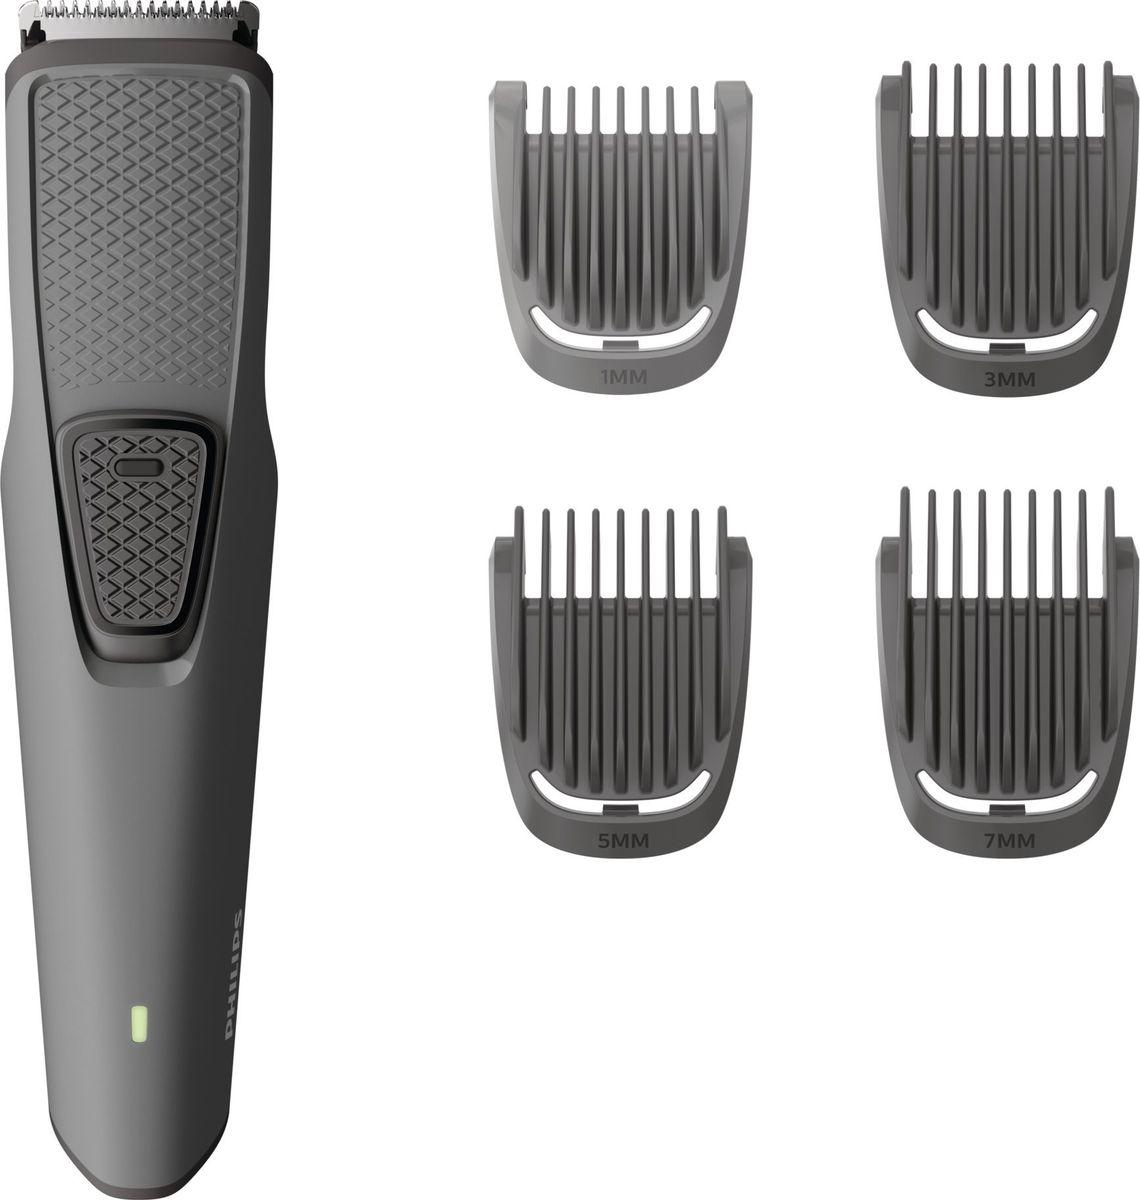 Philips BT1216/10, Dark Gray триммер для бороды